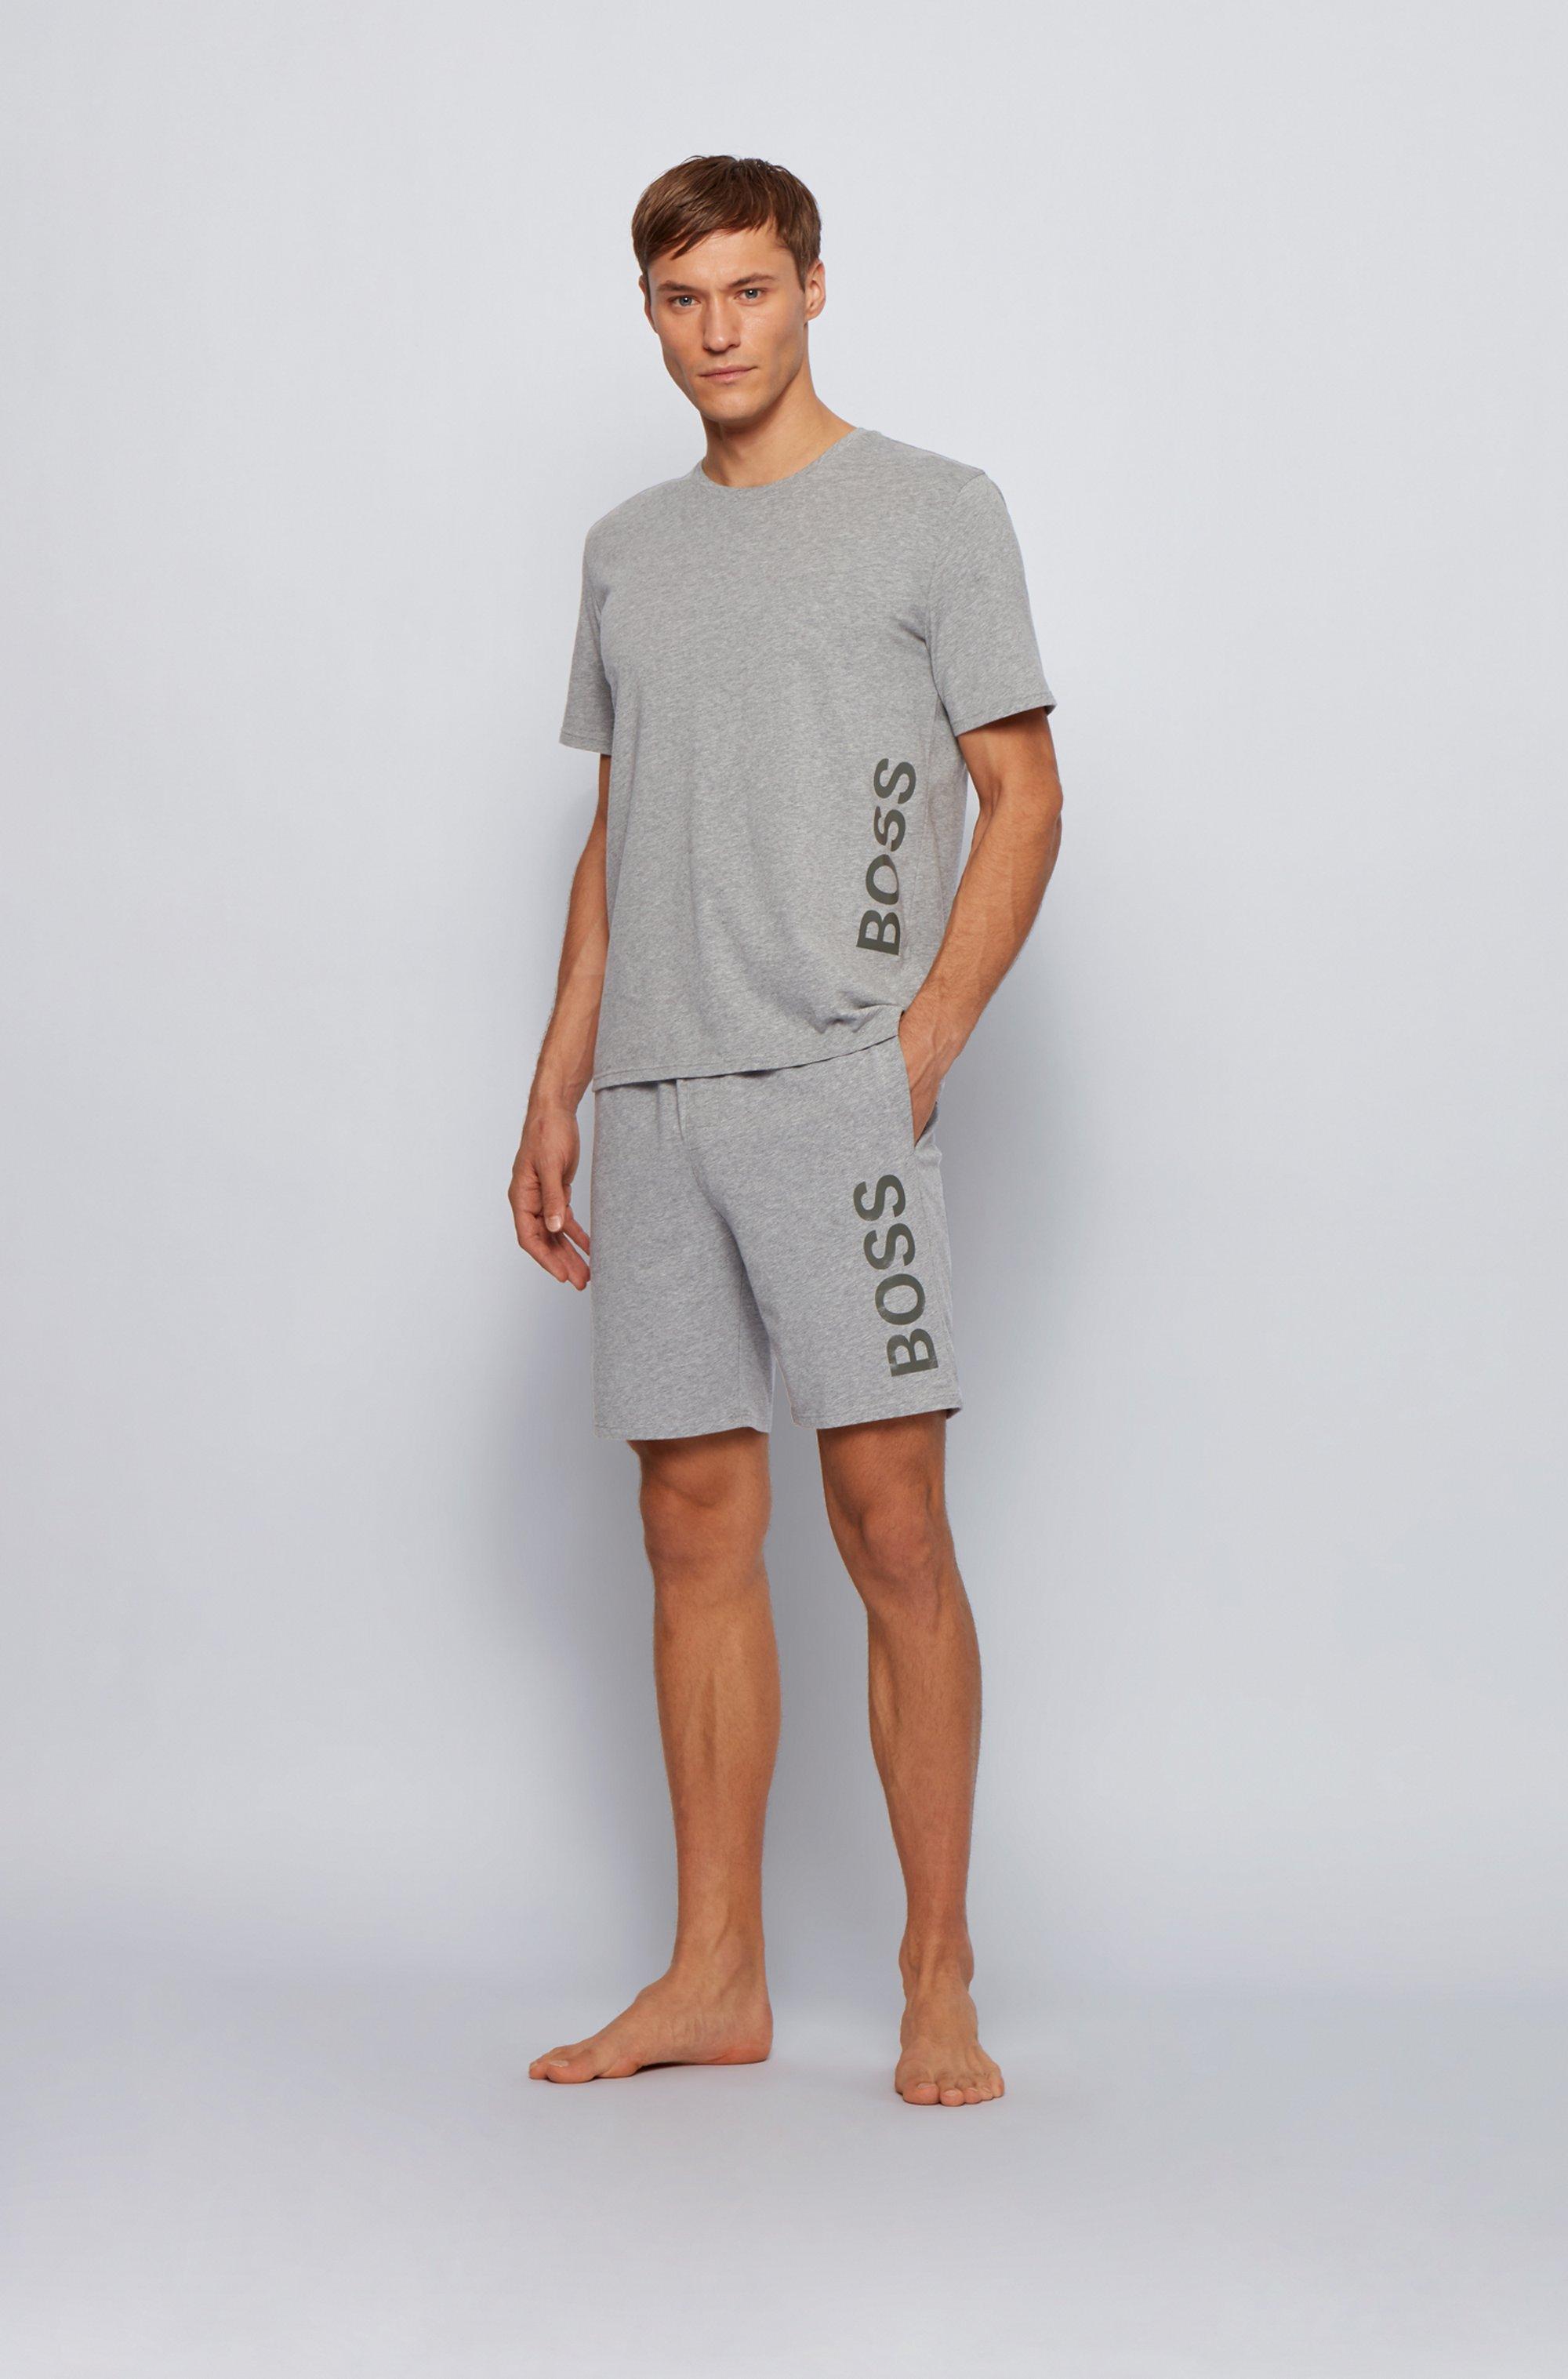 Pyjama-Shirt aus Stretch-Baumwolle mit vertikalem Logo